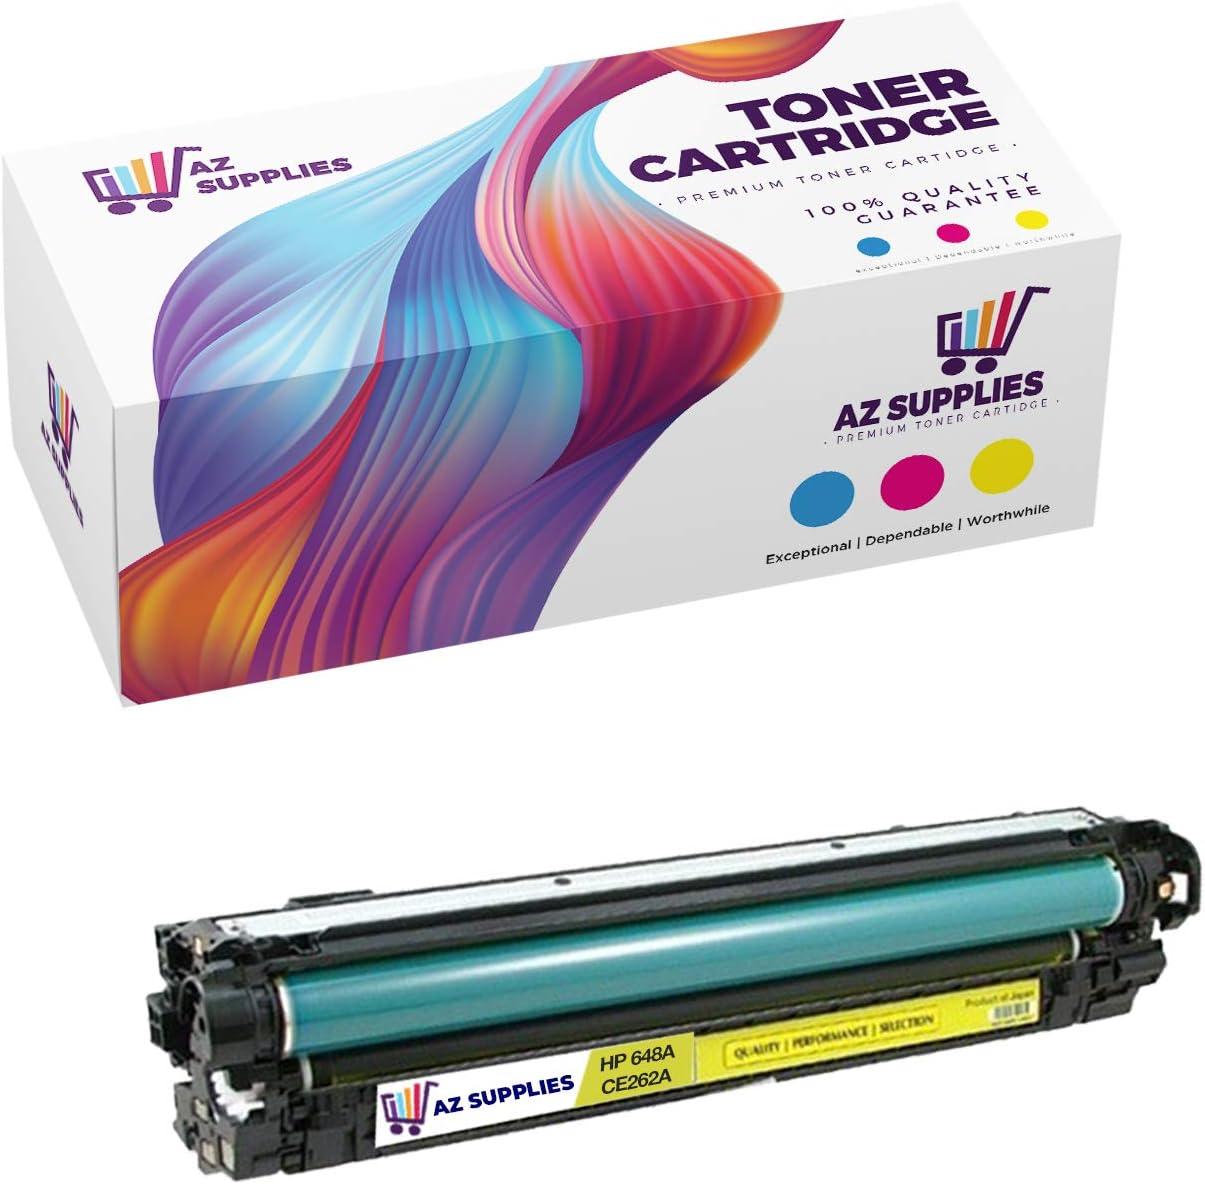 AZ SUPPLIES   20% More Print Yield   Compatible with HP 648A CE262A Yellow for Color Laserjet CP4025 CP4525, CM4540 MFP, CP4525xh, CP4025n, CP4525n, CP4025dn, CP4525dn